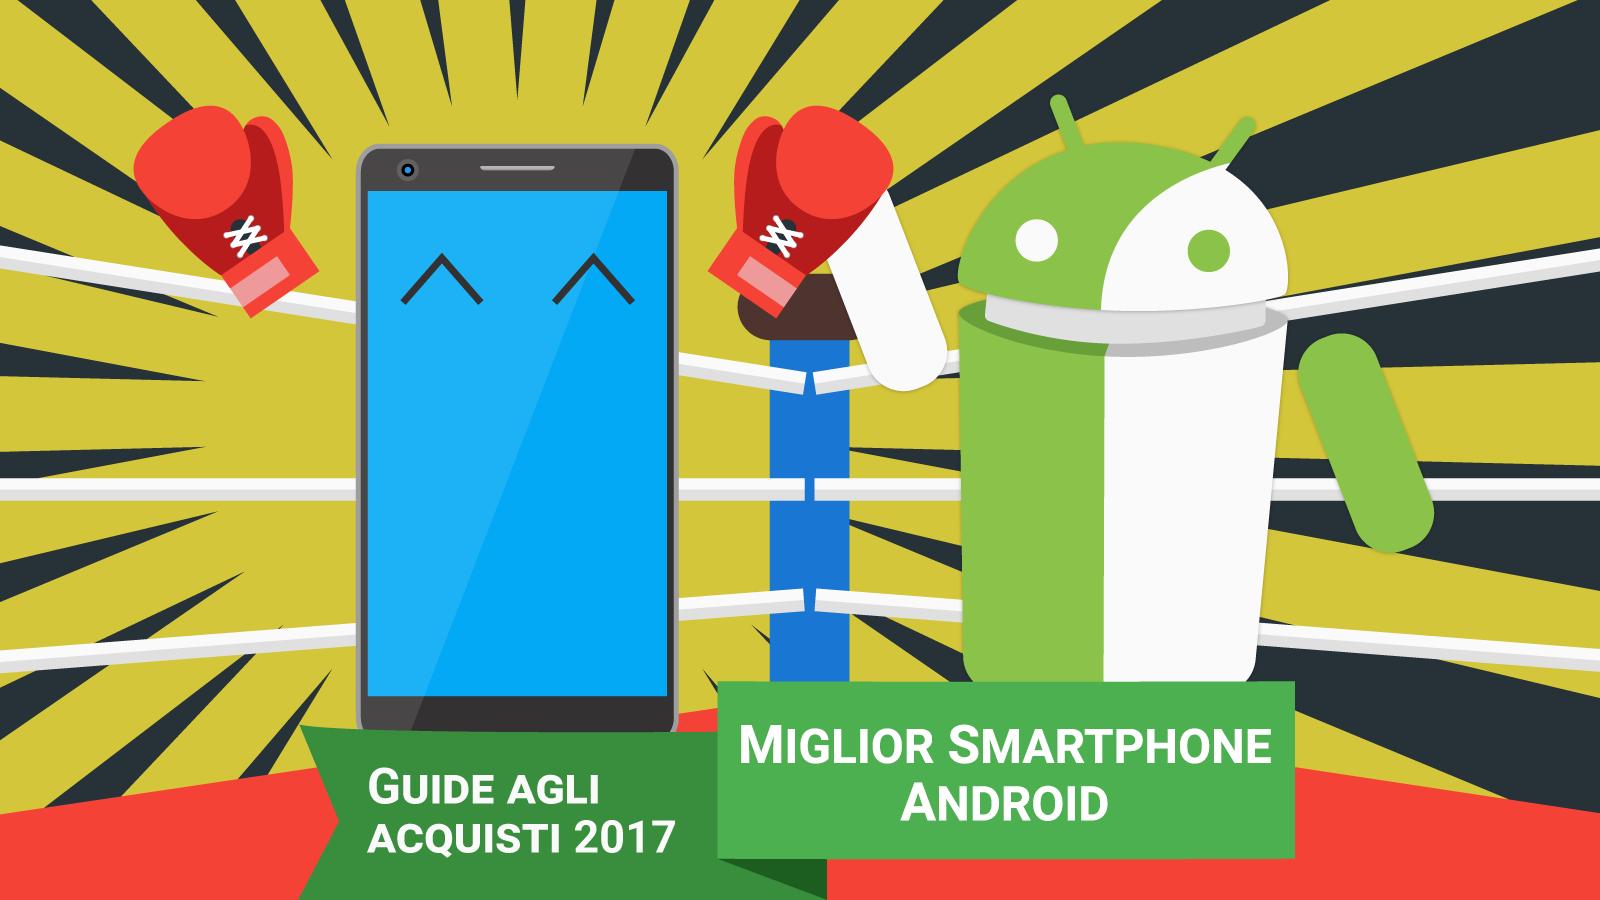 Miglior smartphone Android 2017